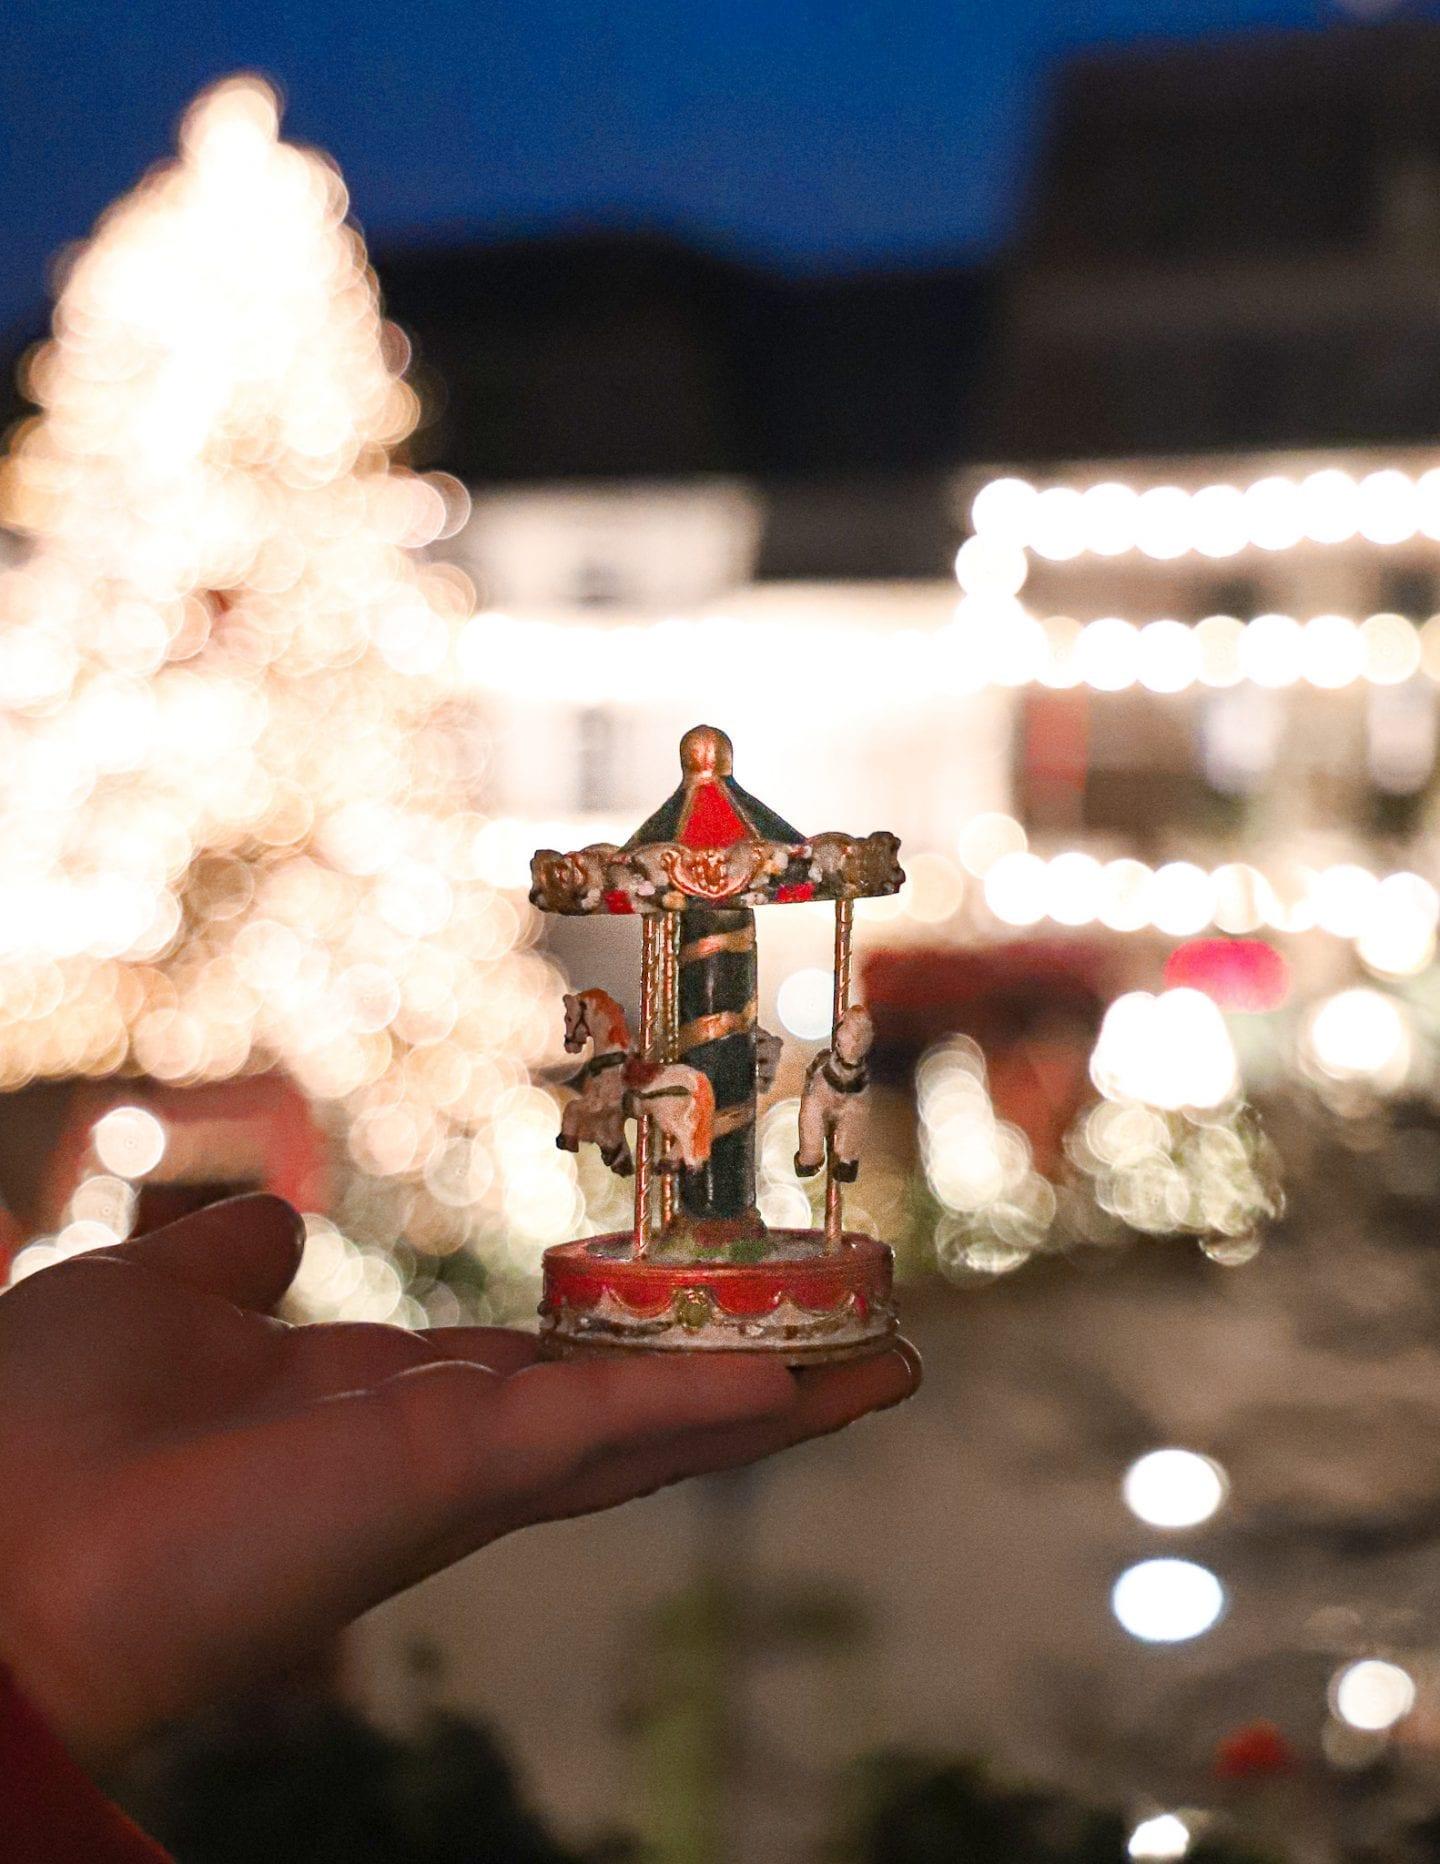 Christmas market ornaments